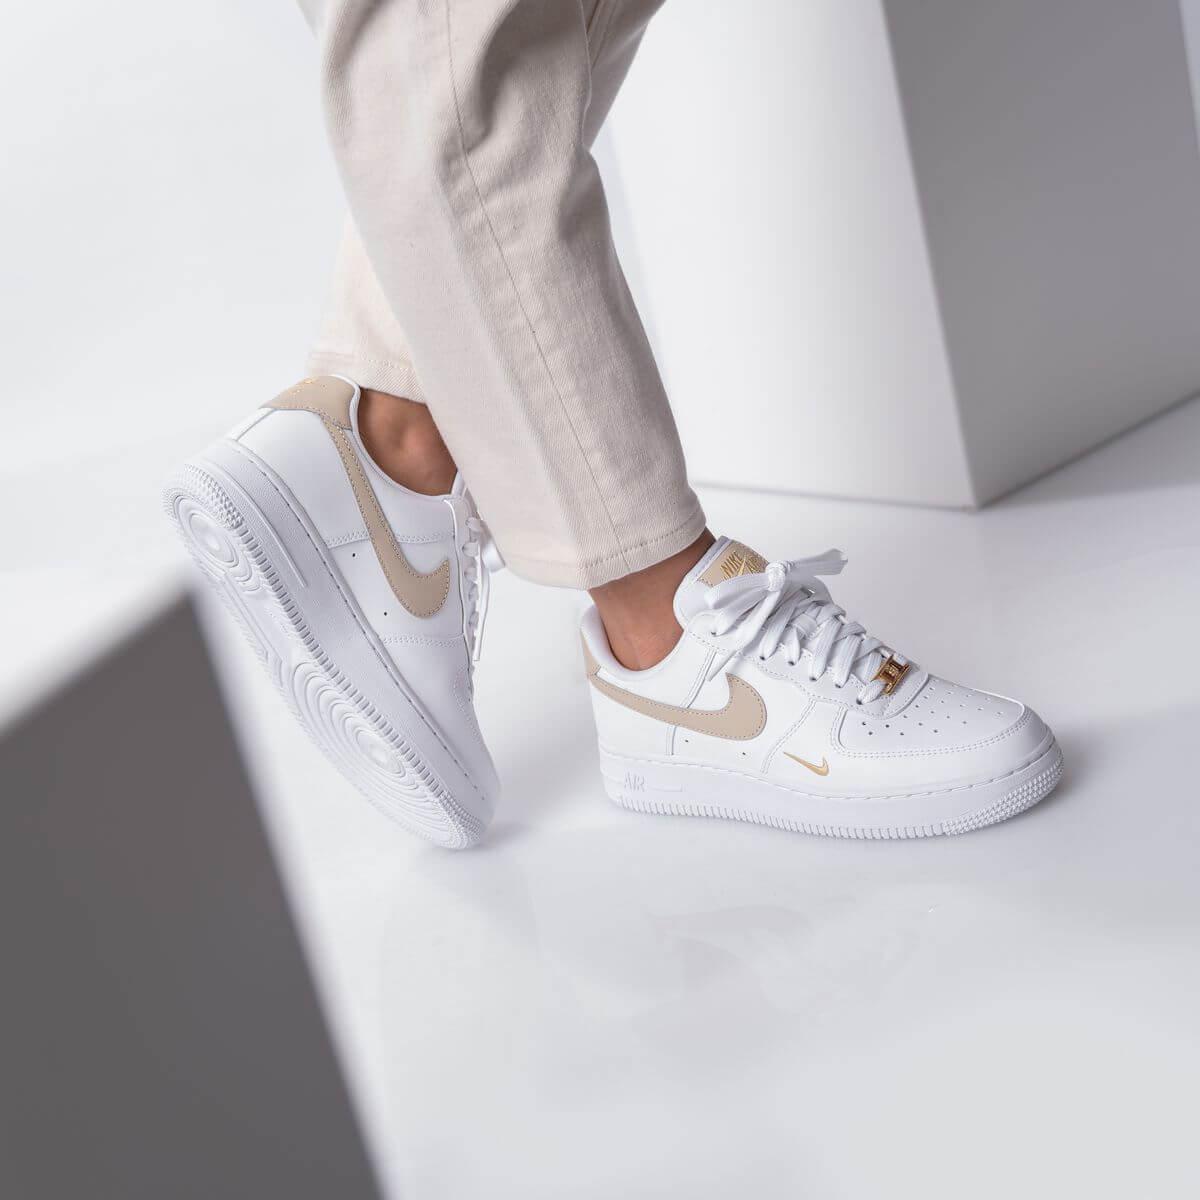 Nike - Wmns Air Force 1 '07 Essential - white/rattan - CZ0270-105